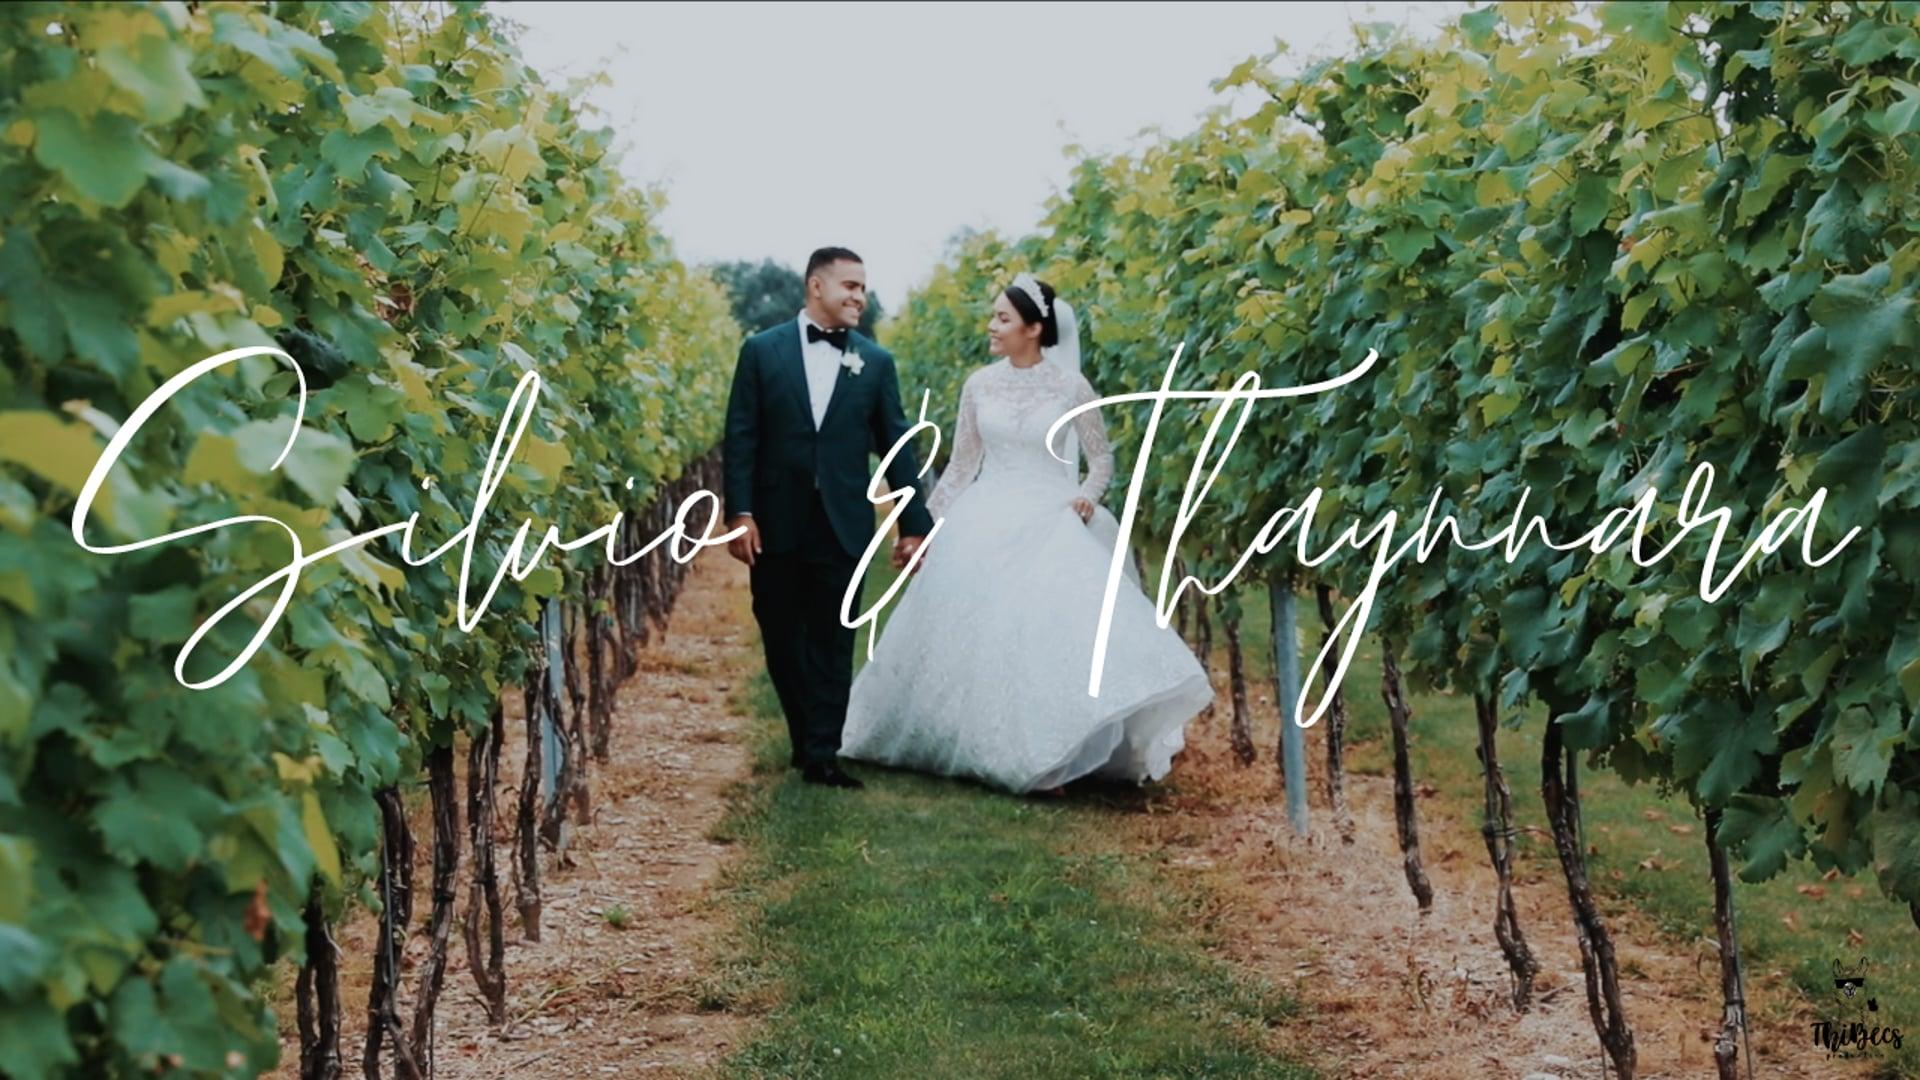 Thaynnara & Silvio | Cinematic Wedding Highlight Video | Kutztown, PA